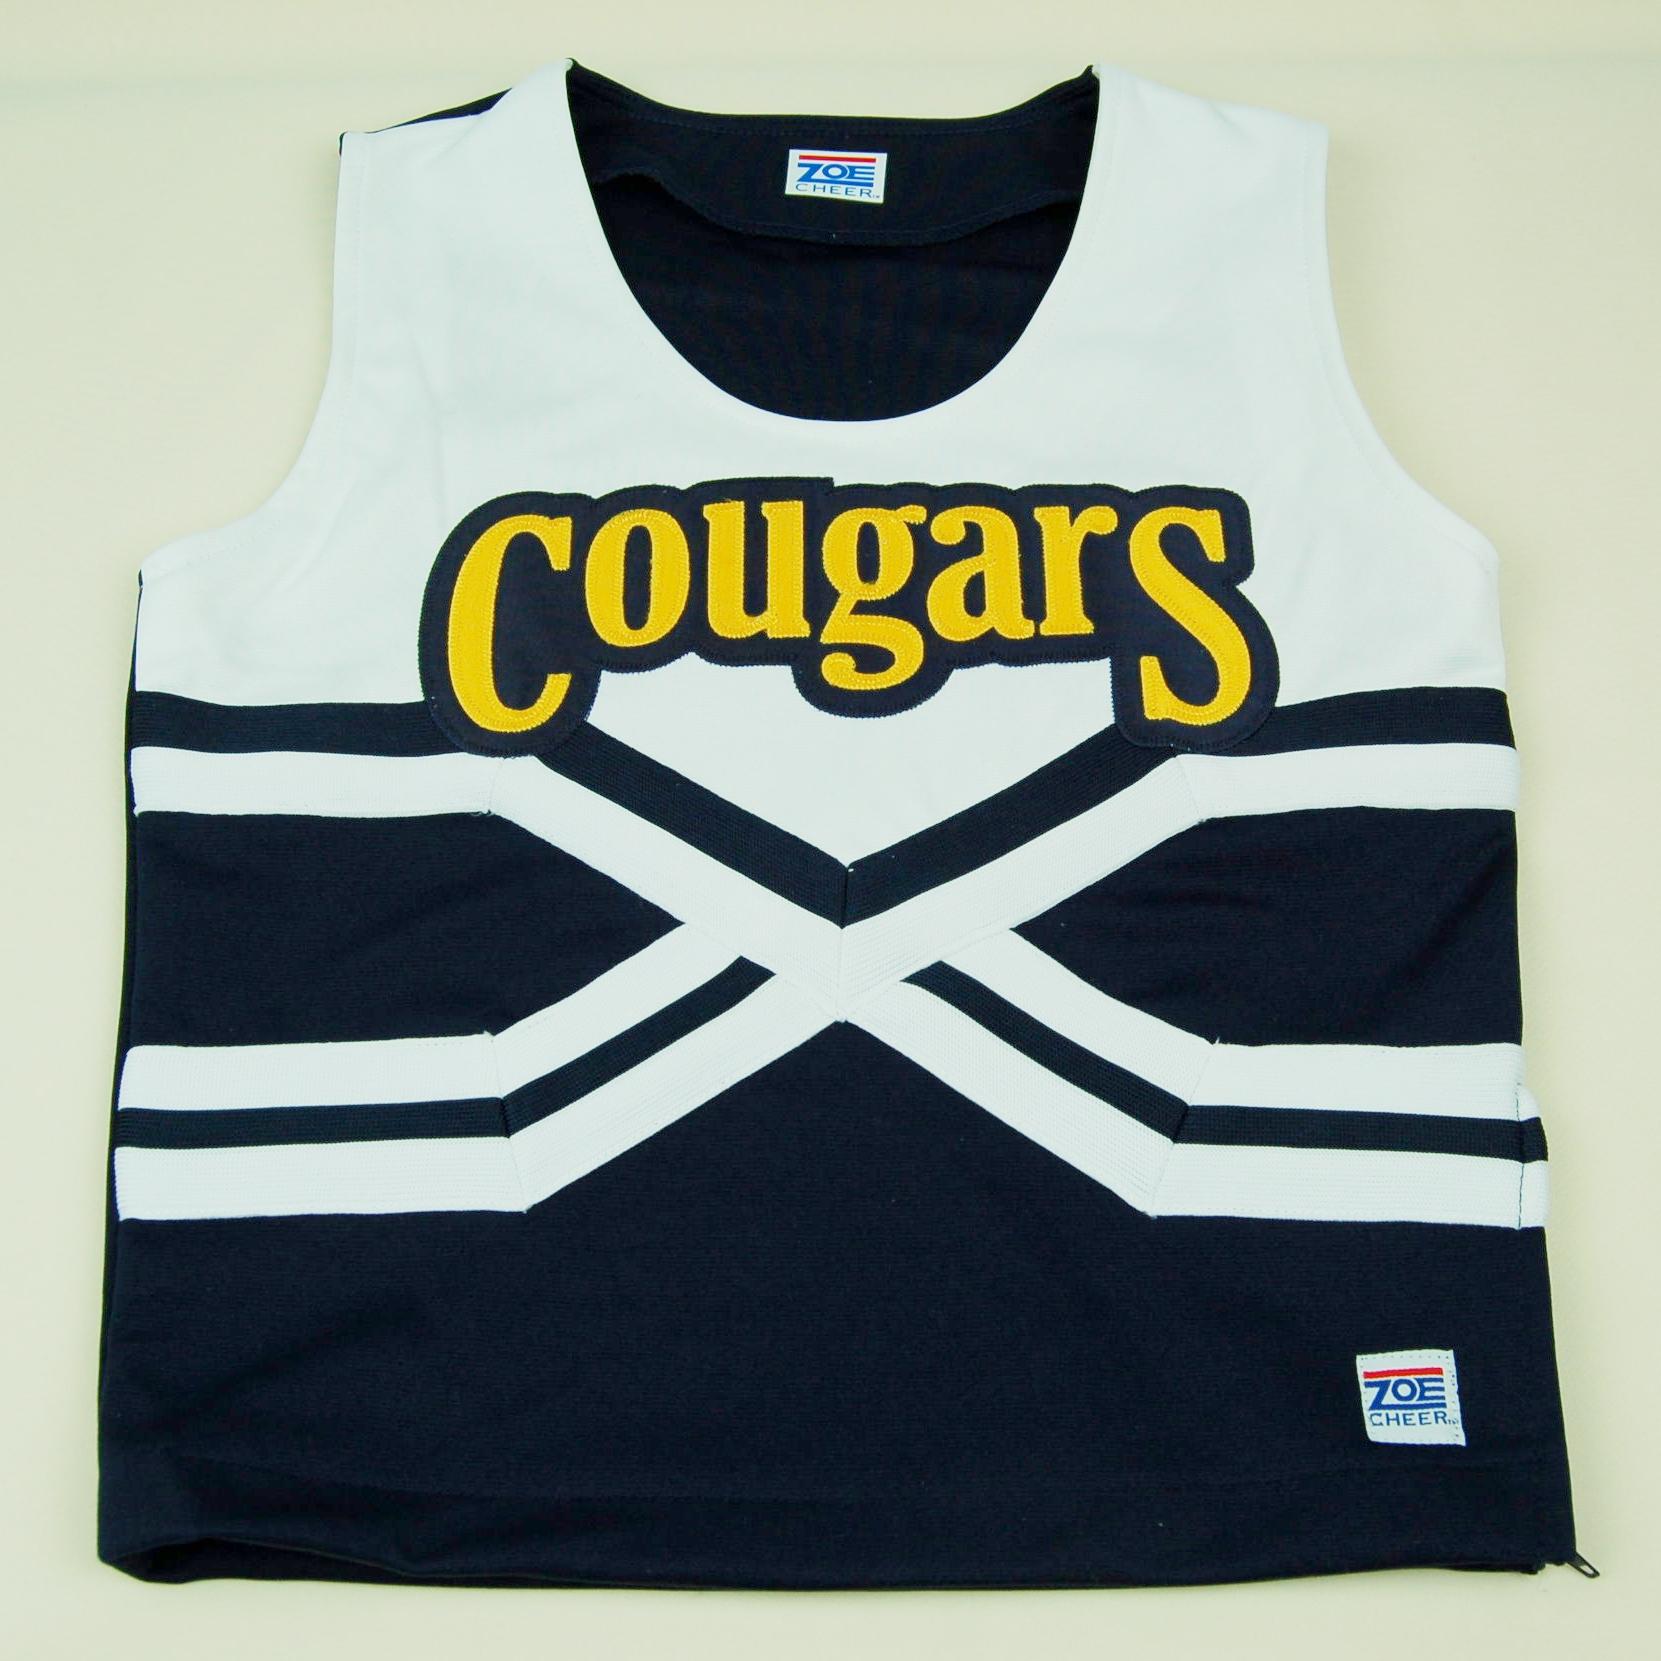 Cougars Cheer